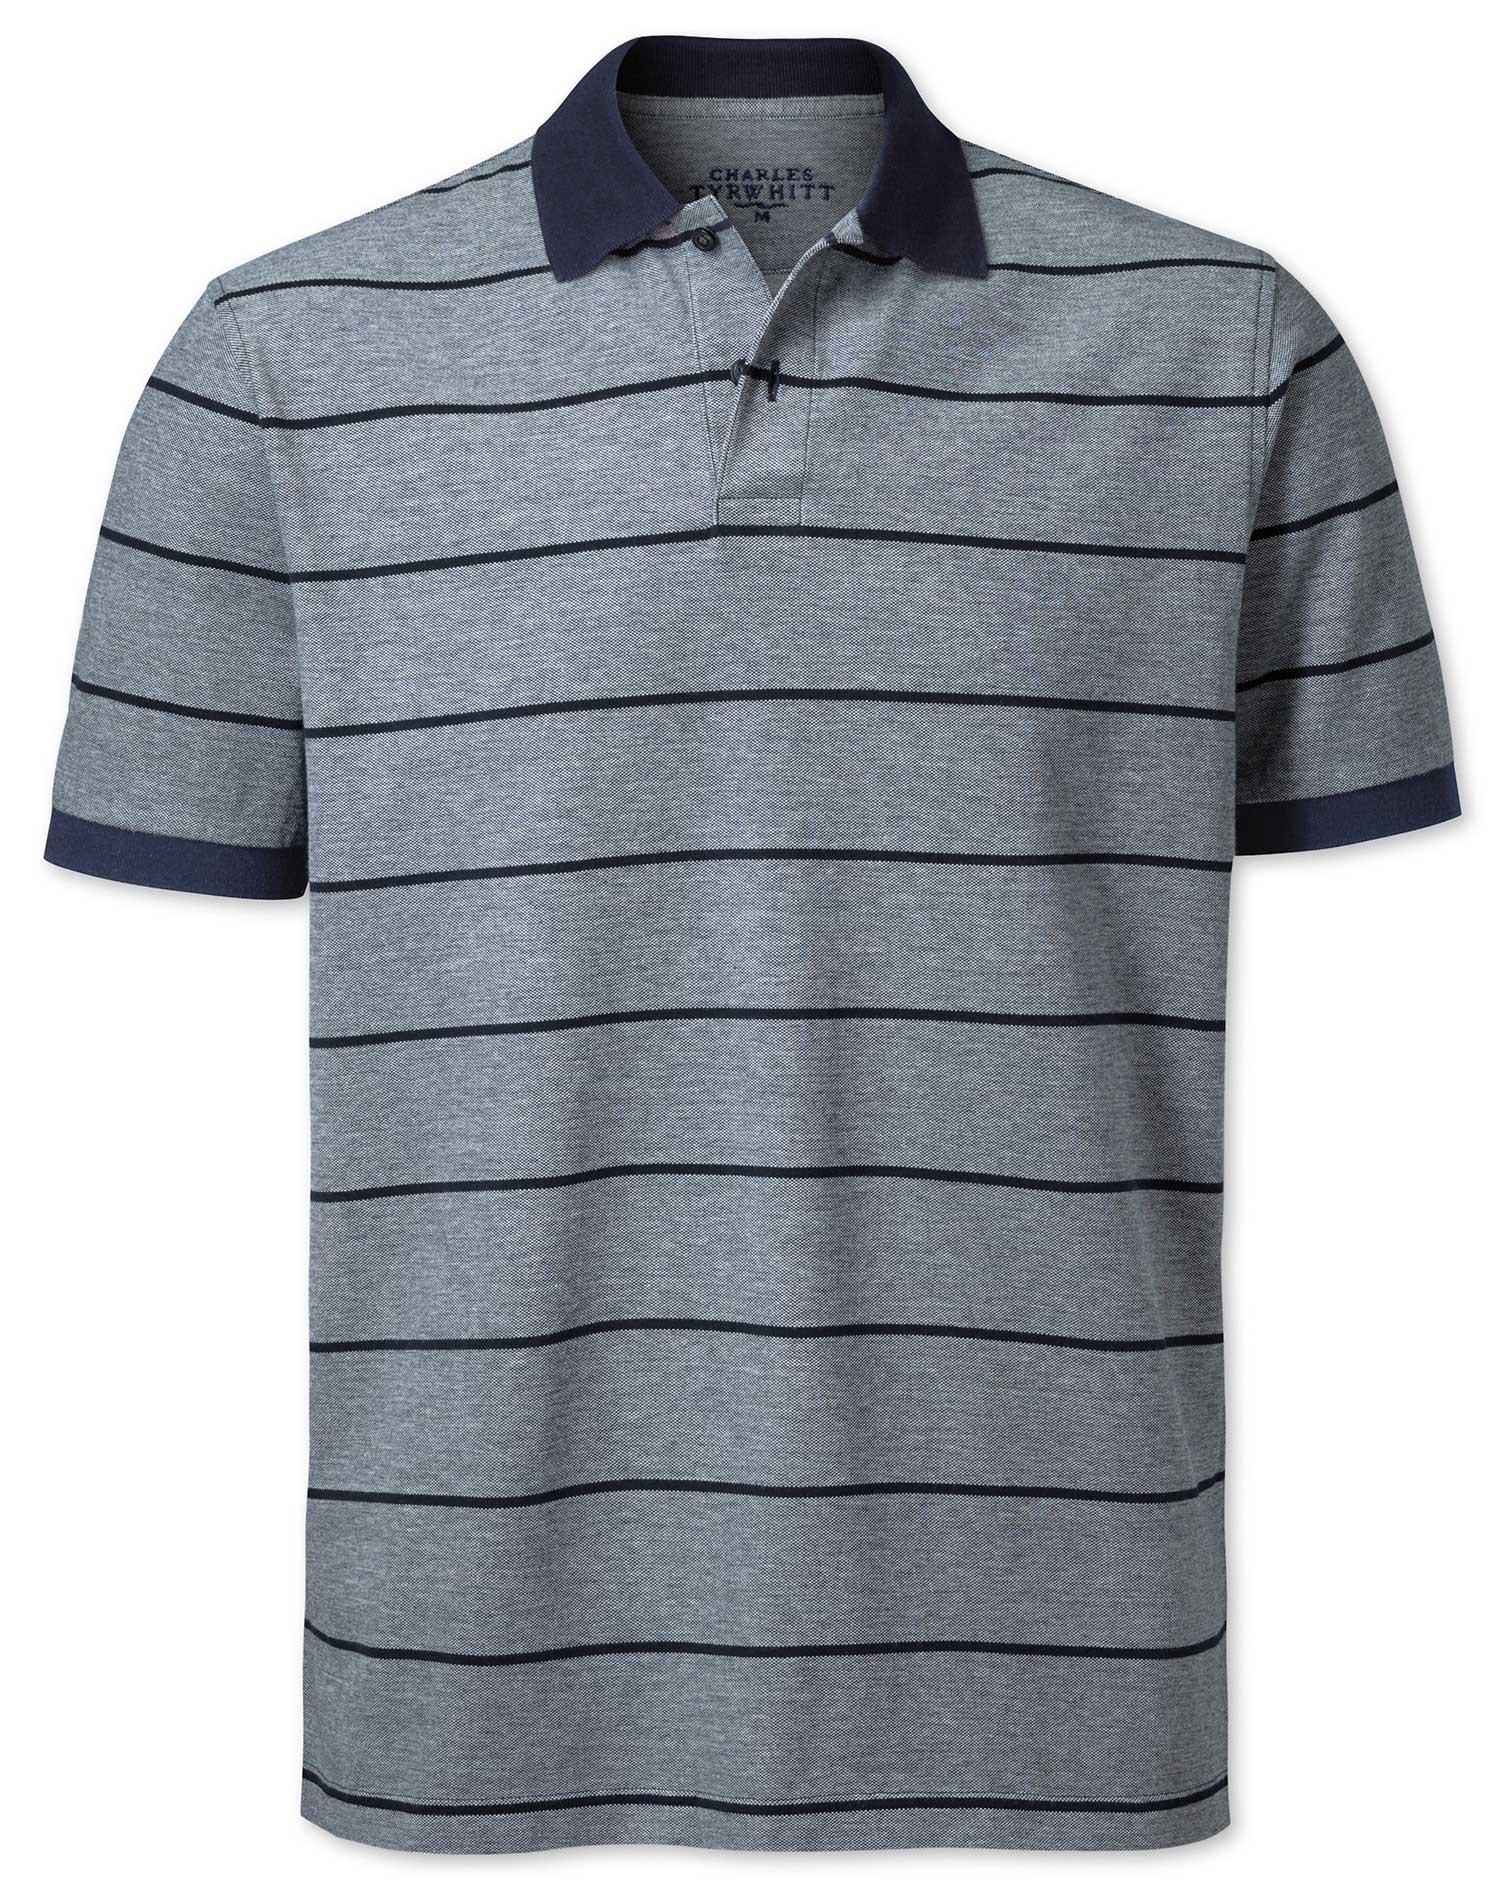 Navy Stripe Oxford Pique Cotton Polo Size Medium by Charles Tyrwhitt